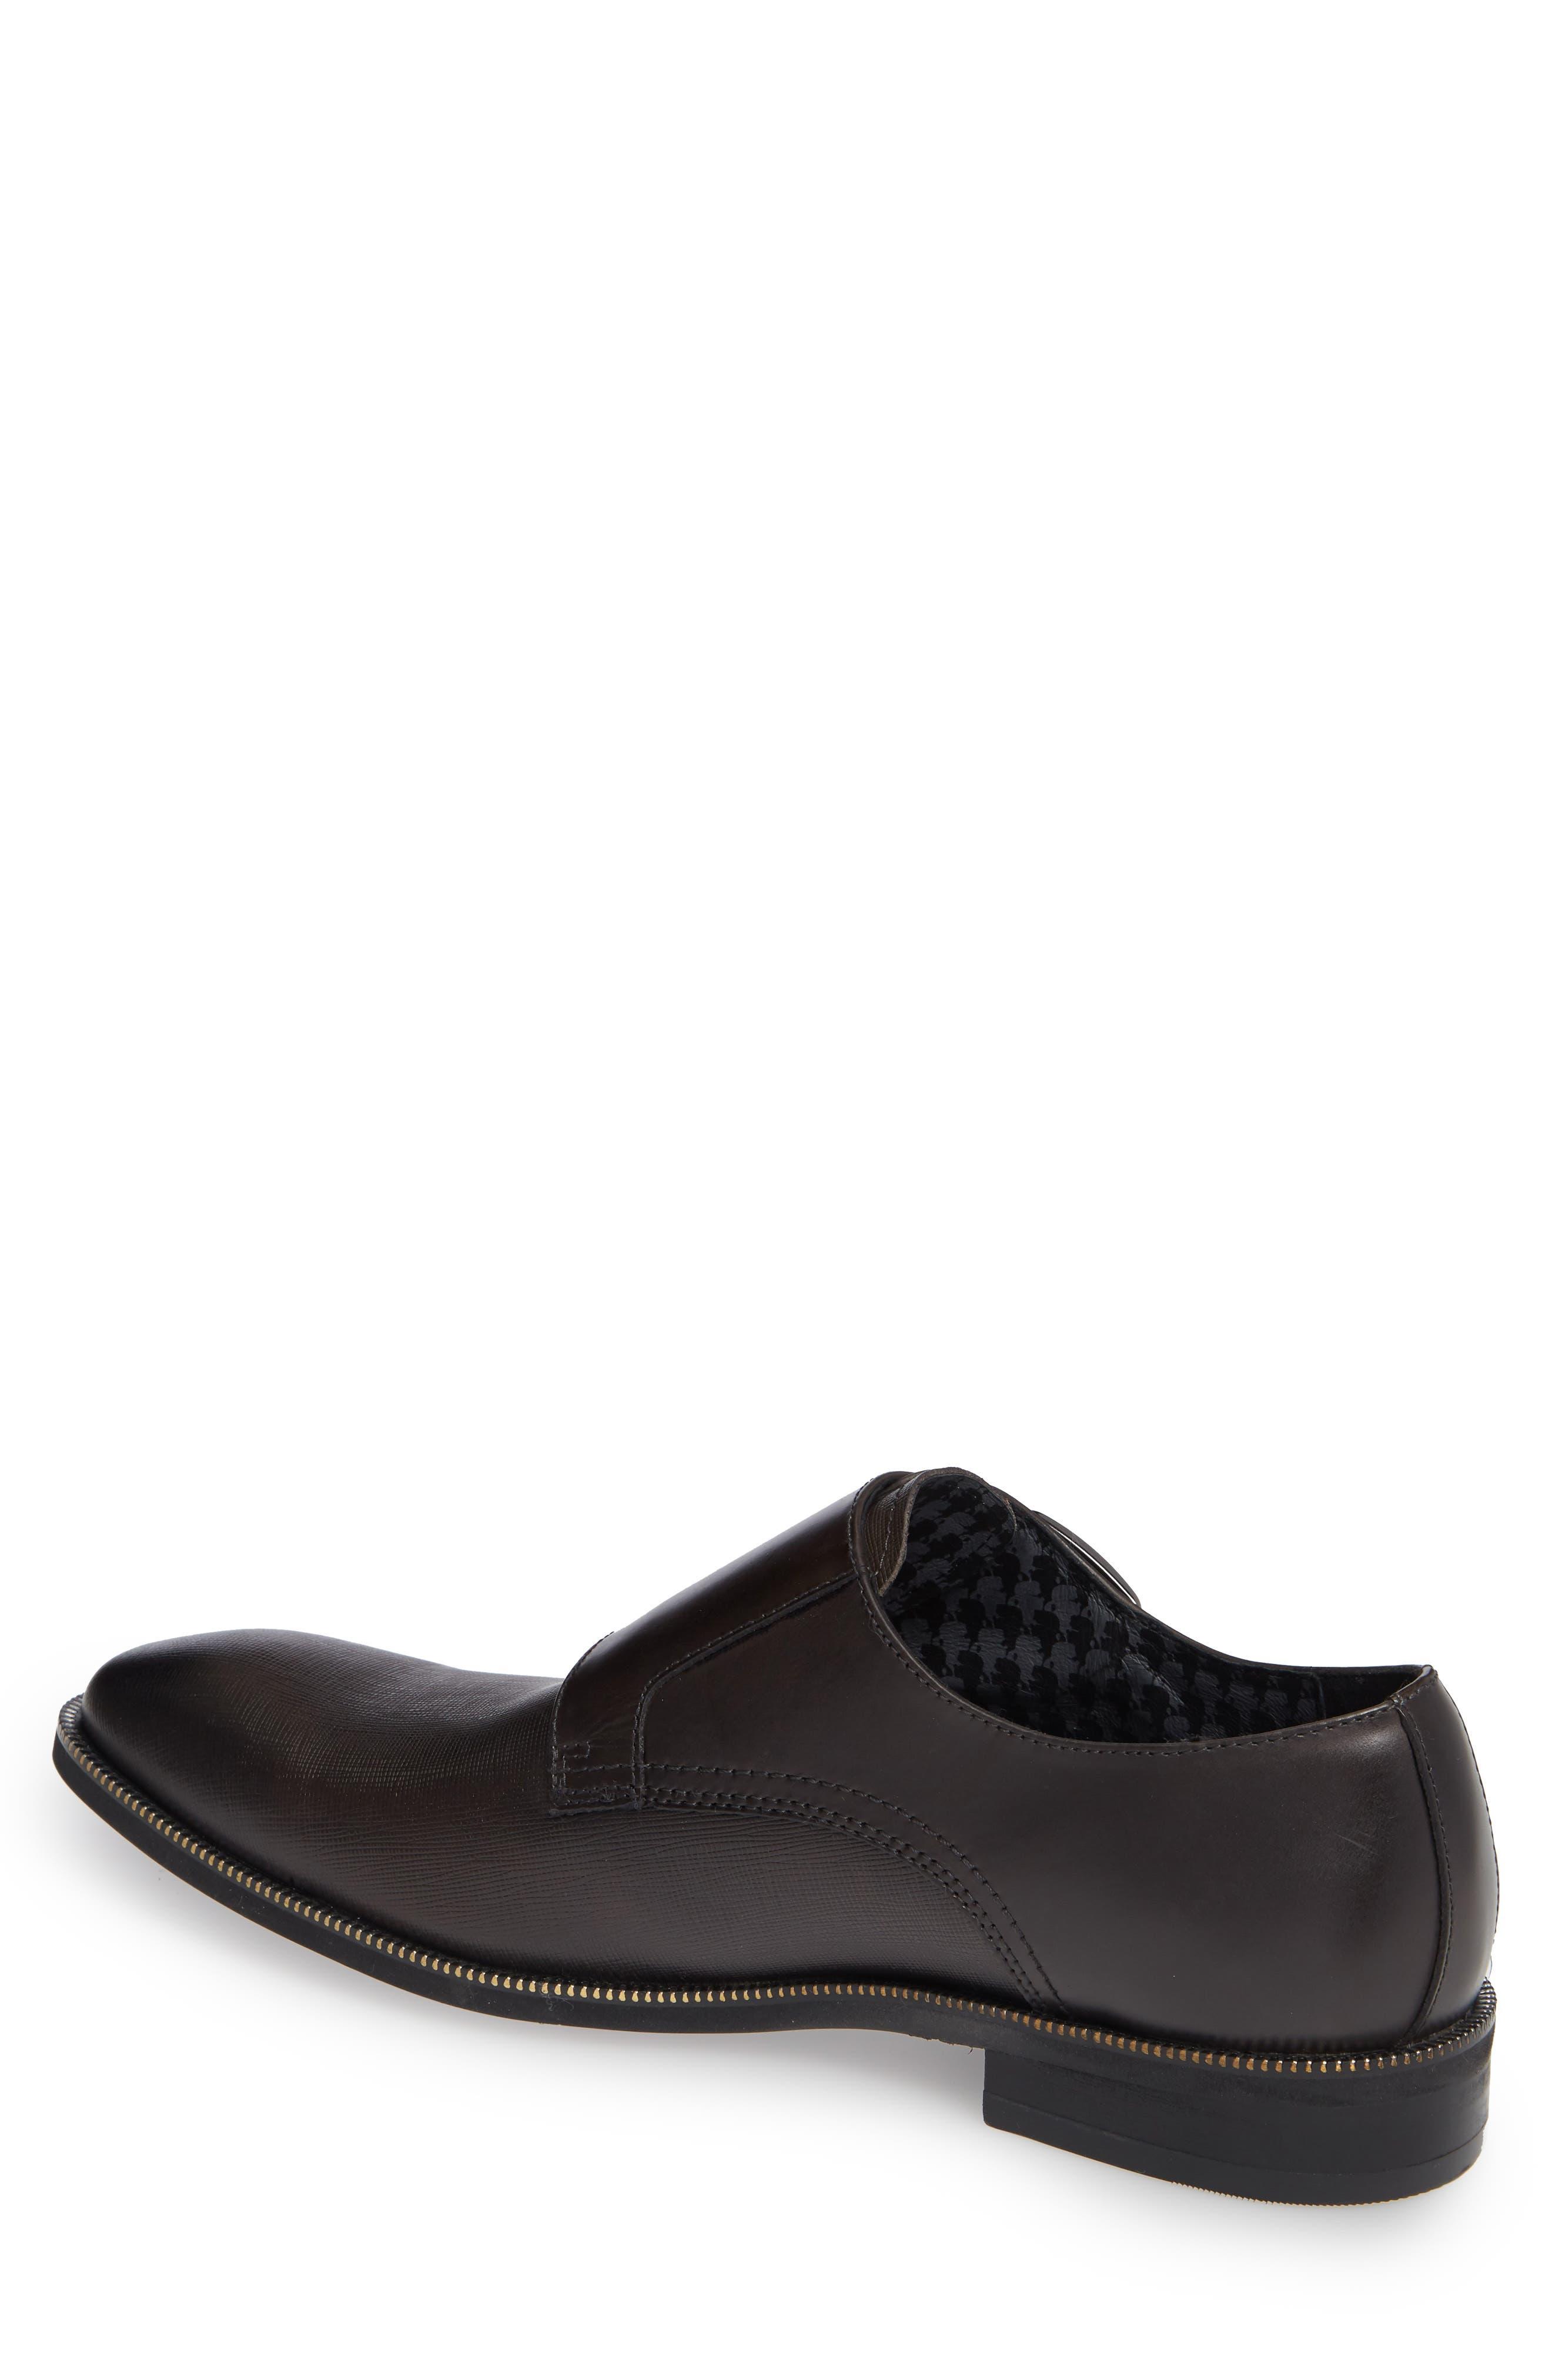 Double Strap Monk Shoe,                             Alternate thumbnail 2, color,                             DARK GREY